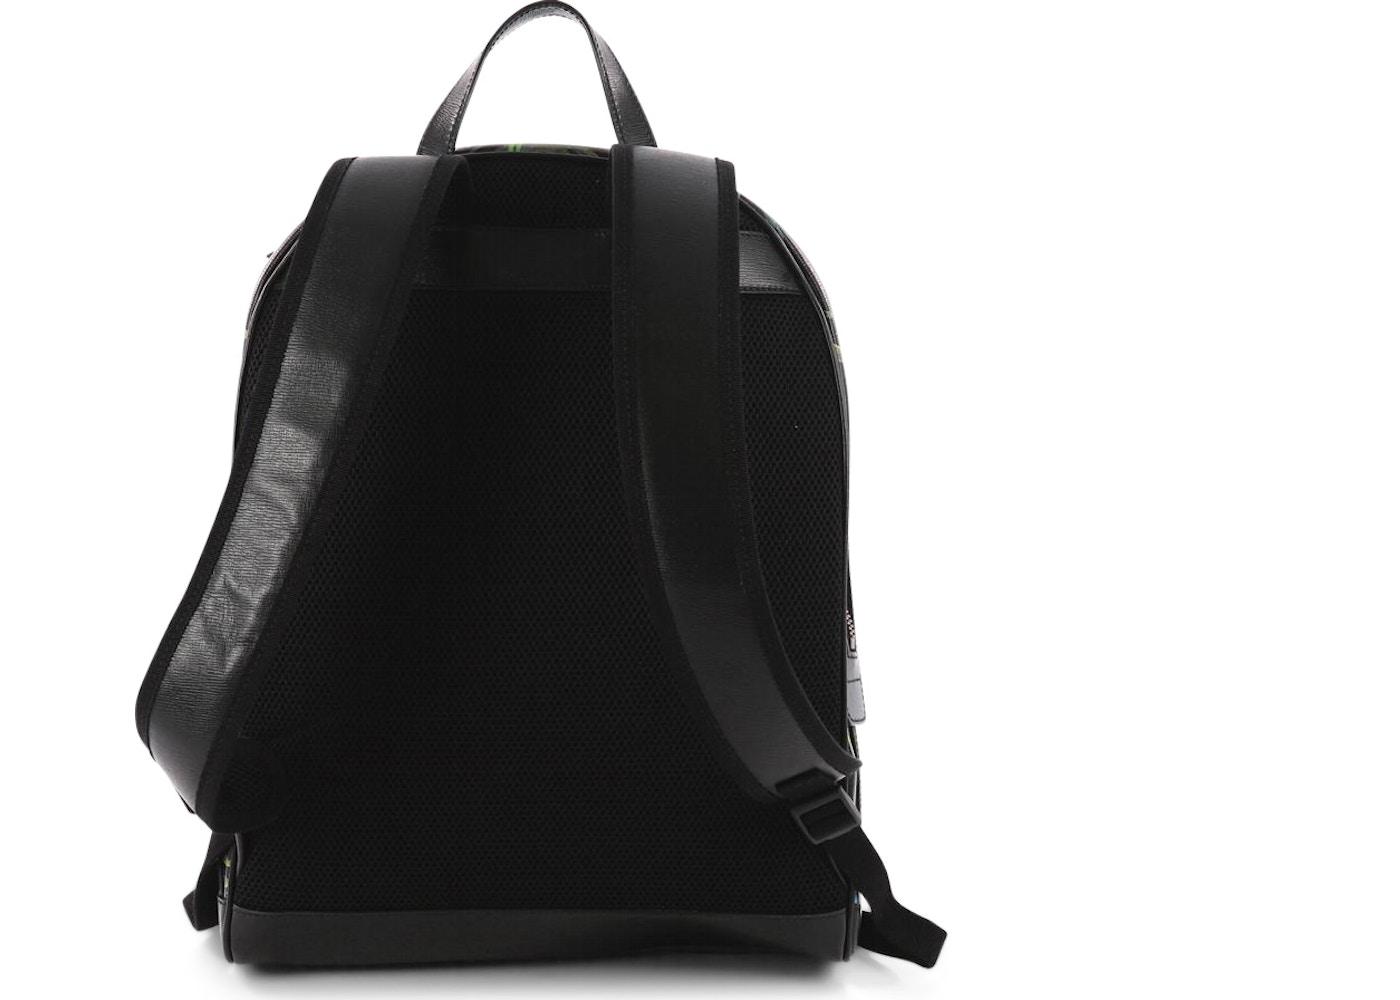 c06c634ae259 Gucci Backpack Tropical Medium Black